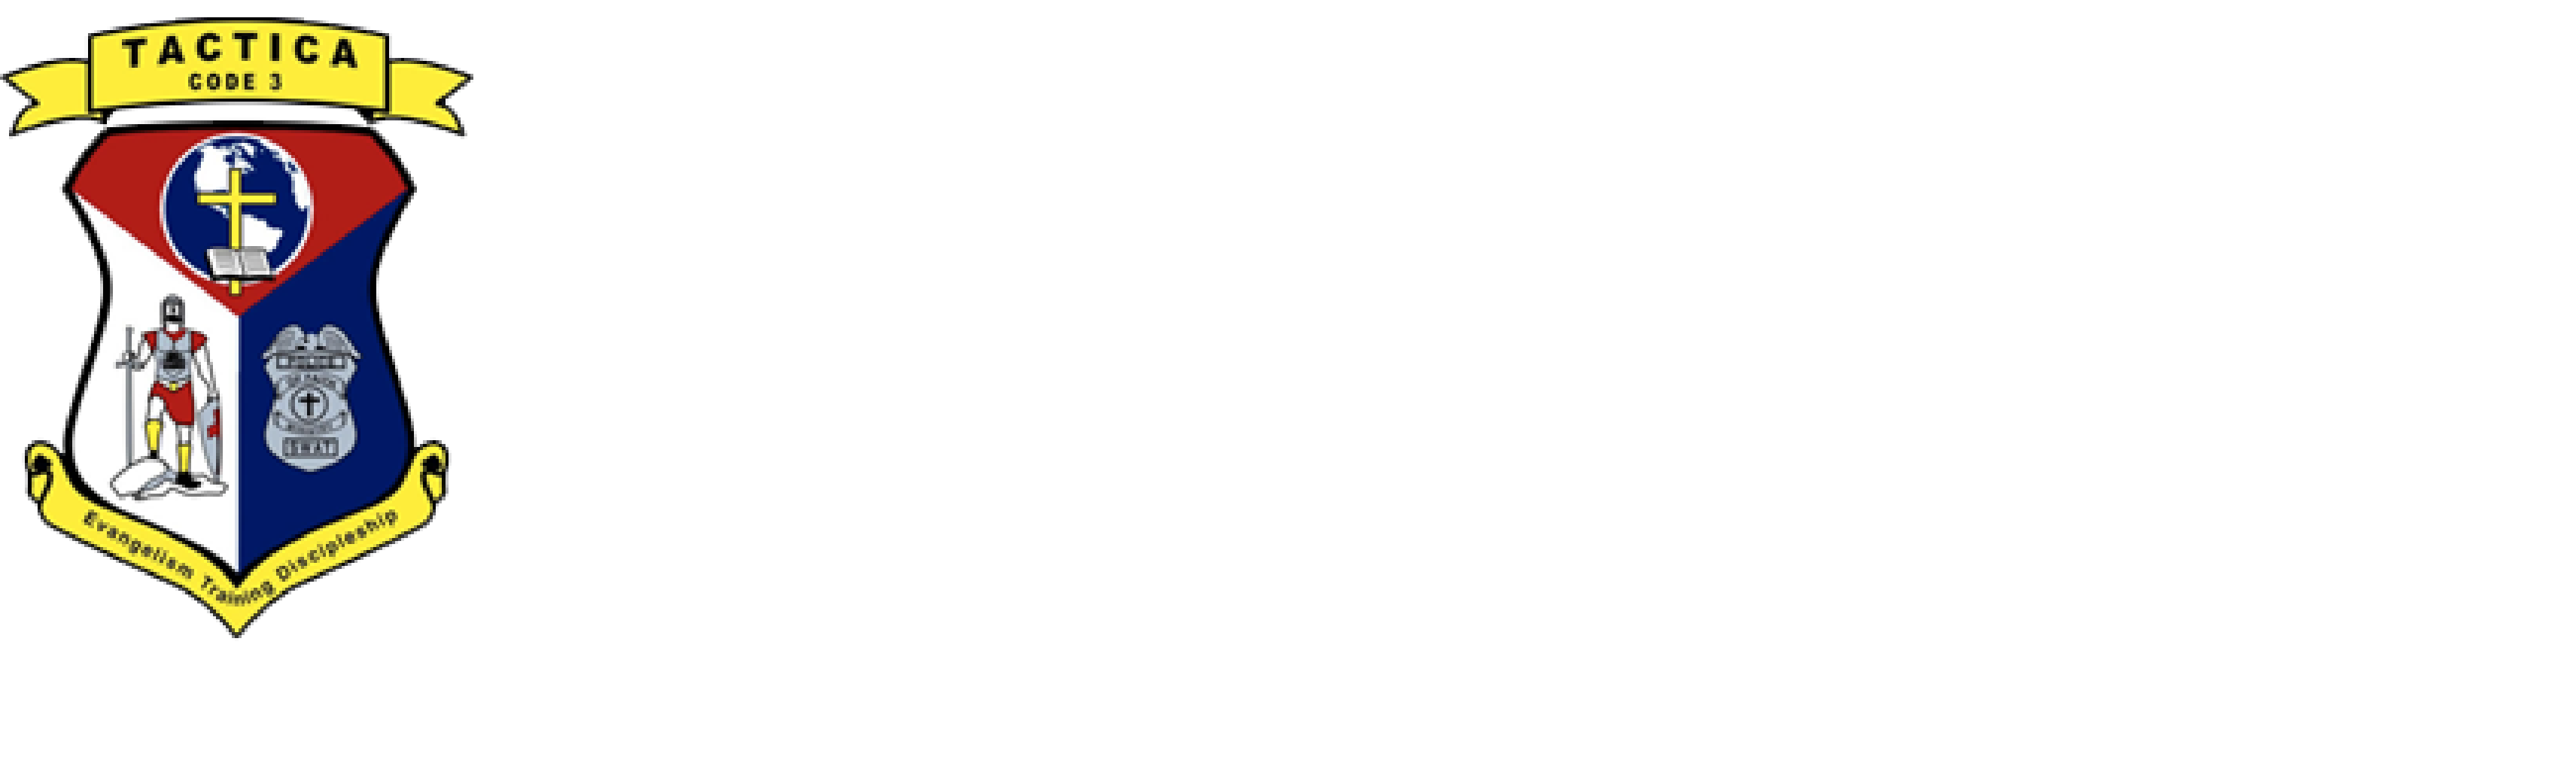 T.A.C.T.I.C.A. MINISTRIES